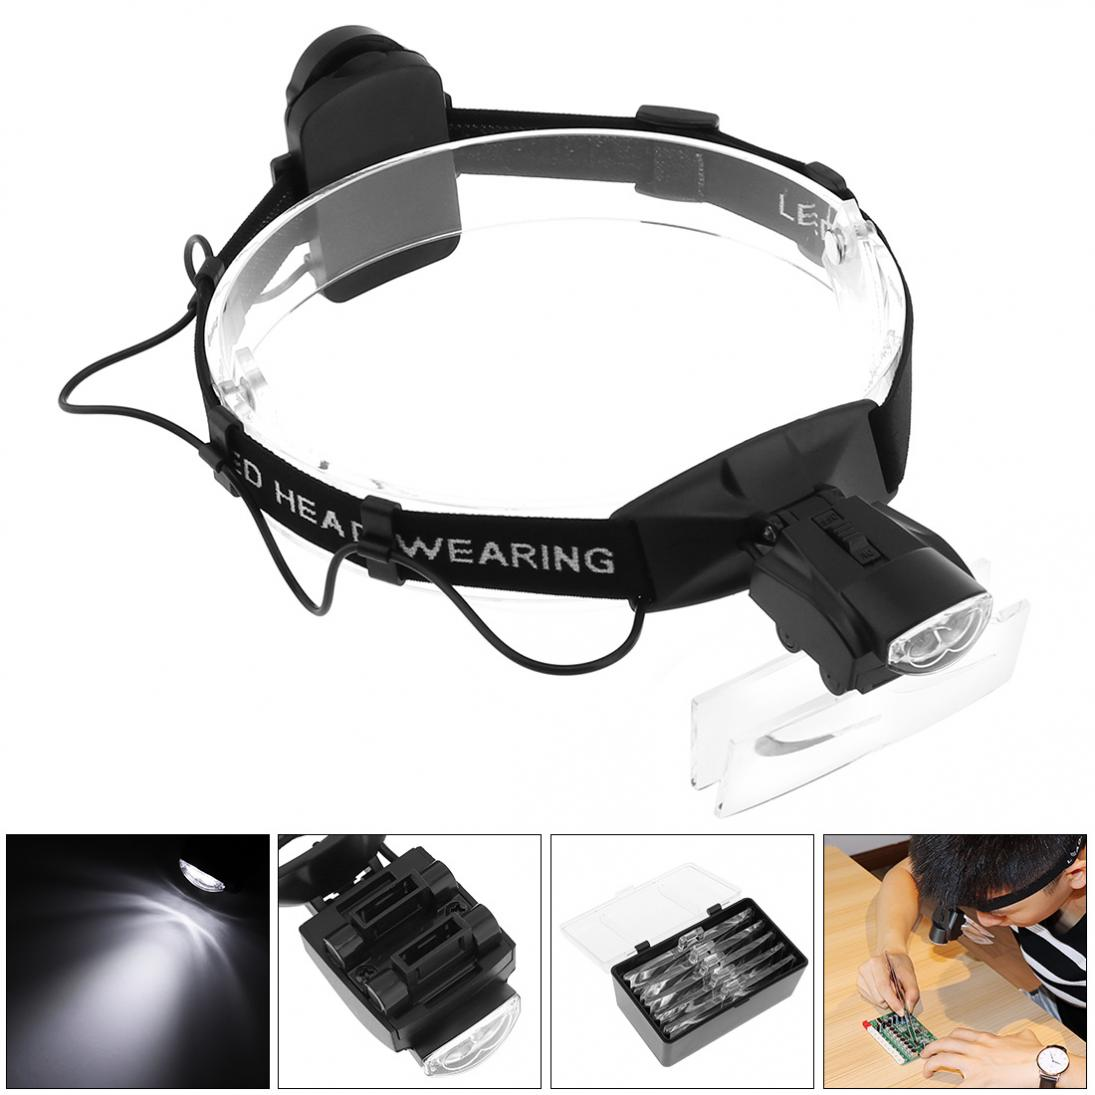 Cabeça lupa 1.0x1.5x2.0x2.5x3.5x5 óculos ajustáveis lupa lente óptica bandana lupa olho reparação lupa